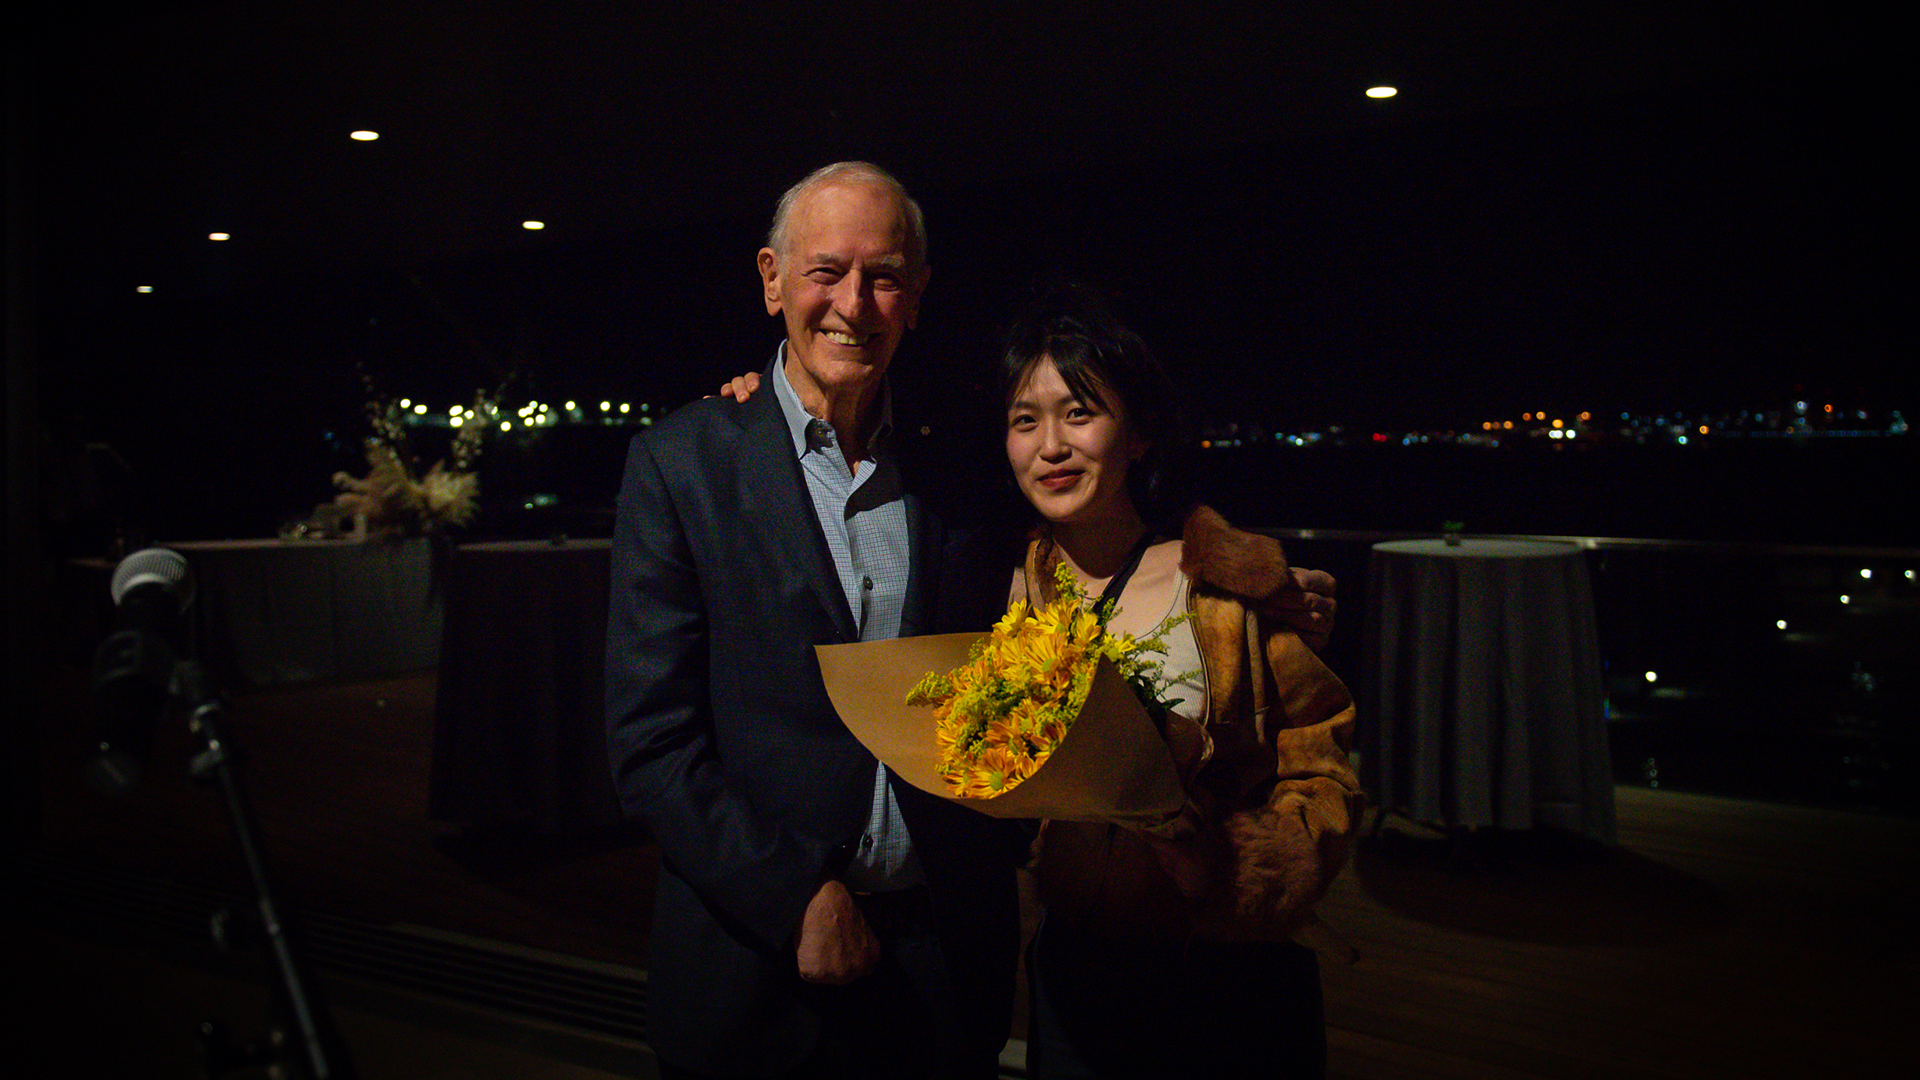 Philip B. Lind Emerging Artist Prize Winner Announced